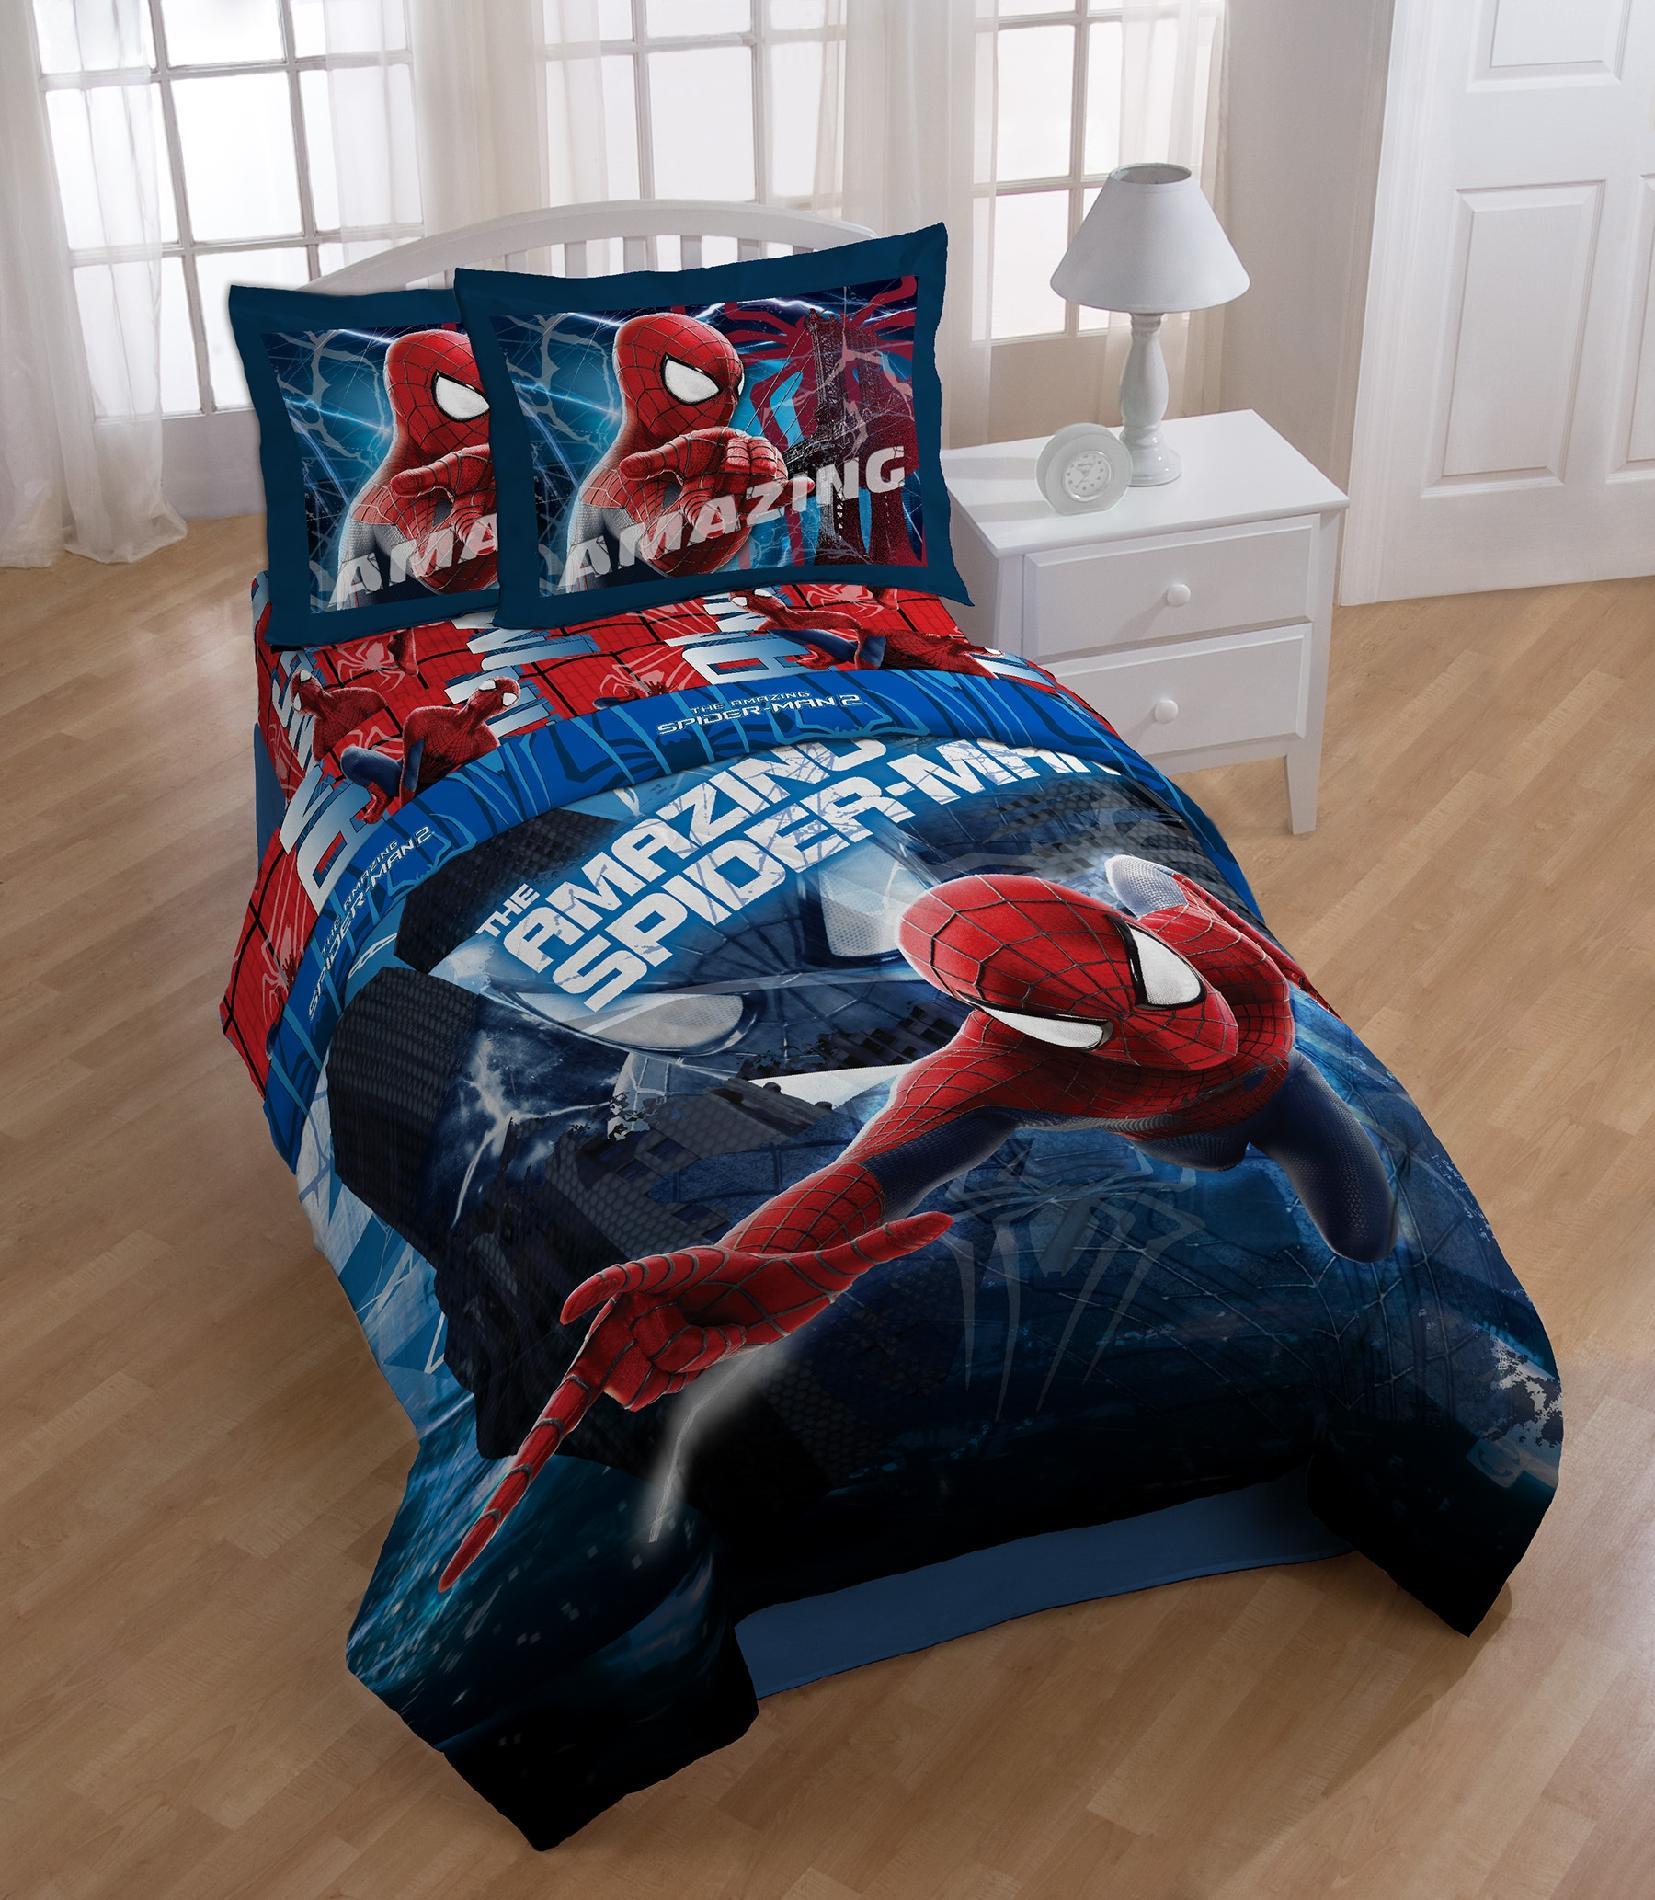 Marvel Spiderman Twin Full Comforter